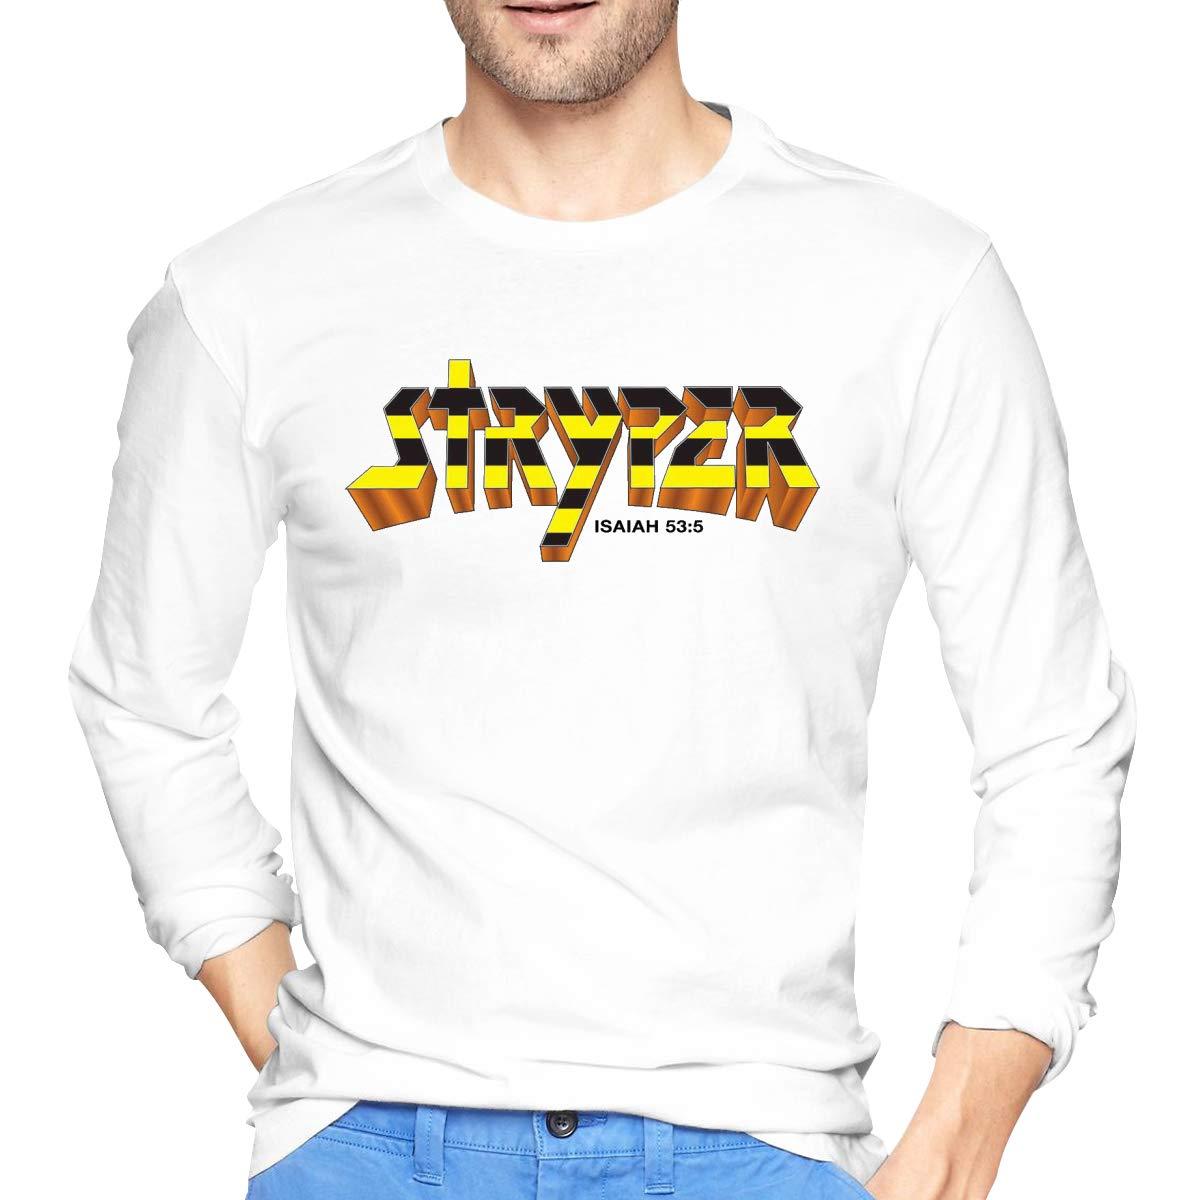 Lihehen Man Stryper Simple Casual Round Neck Shirt